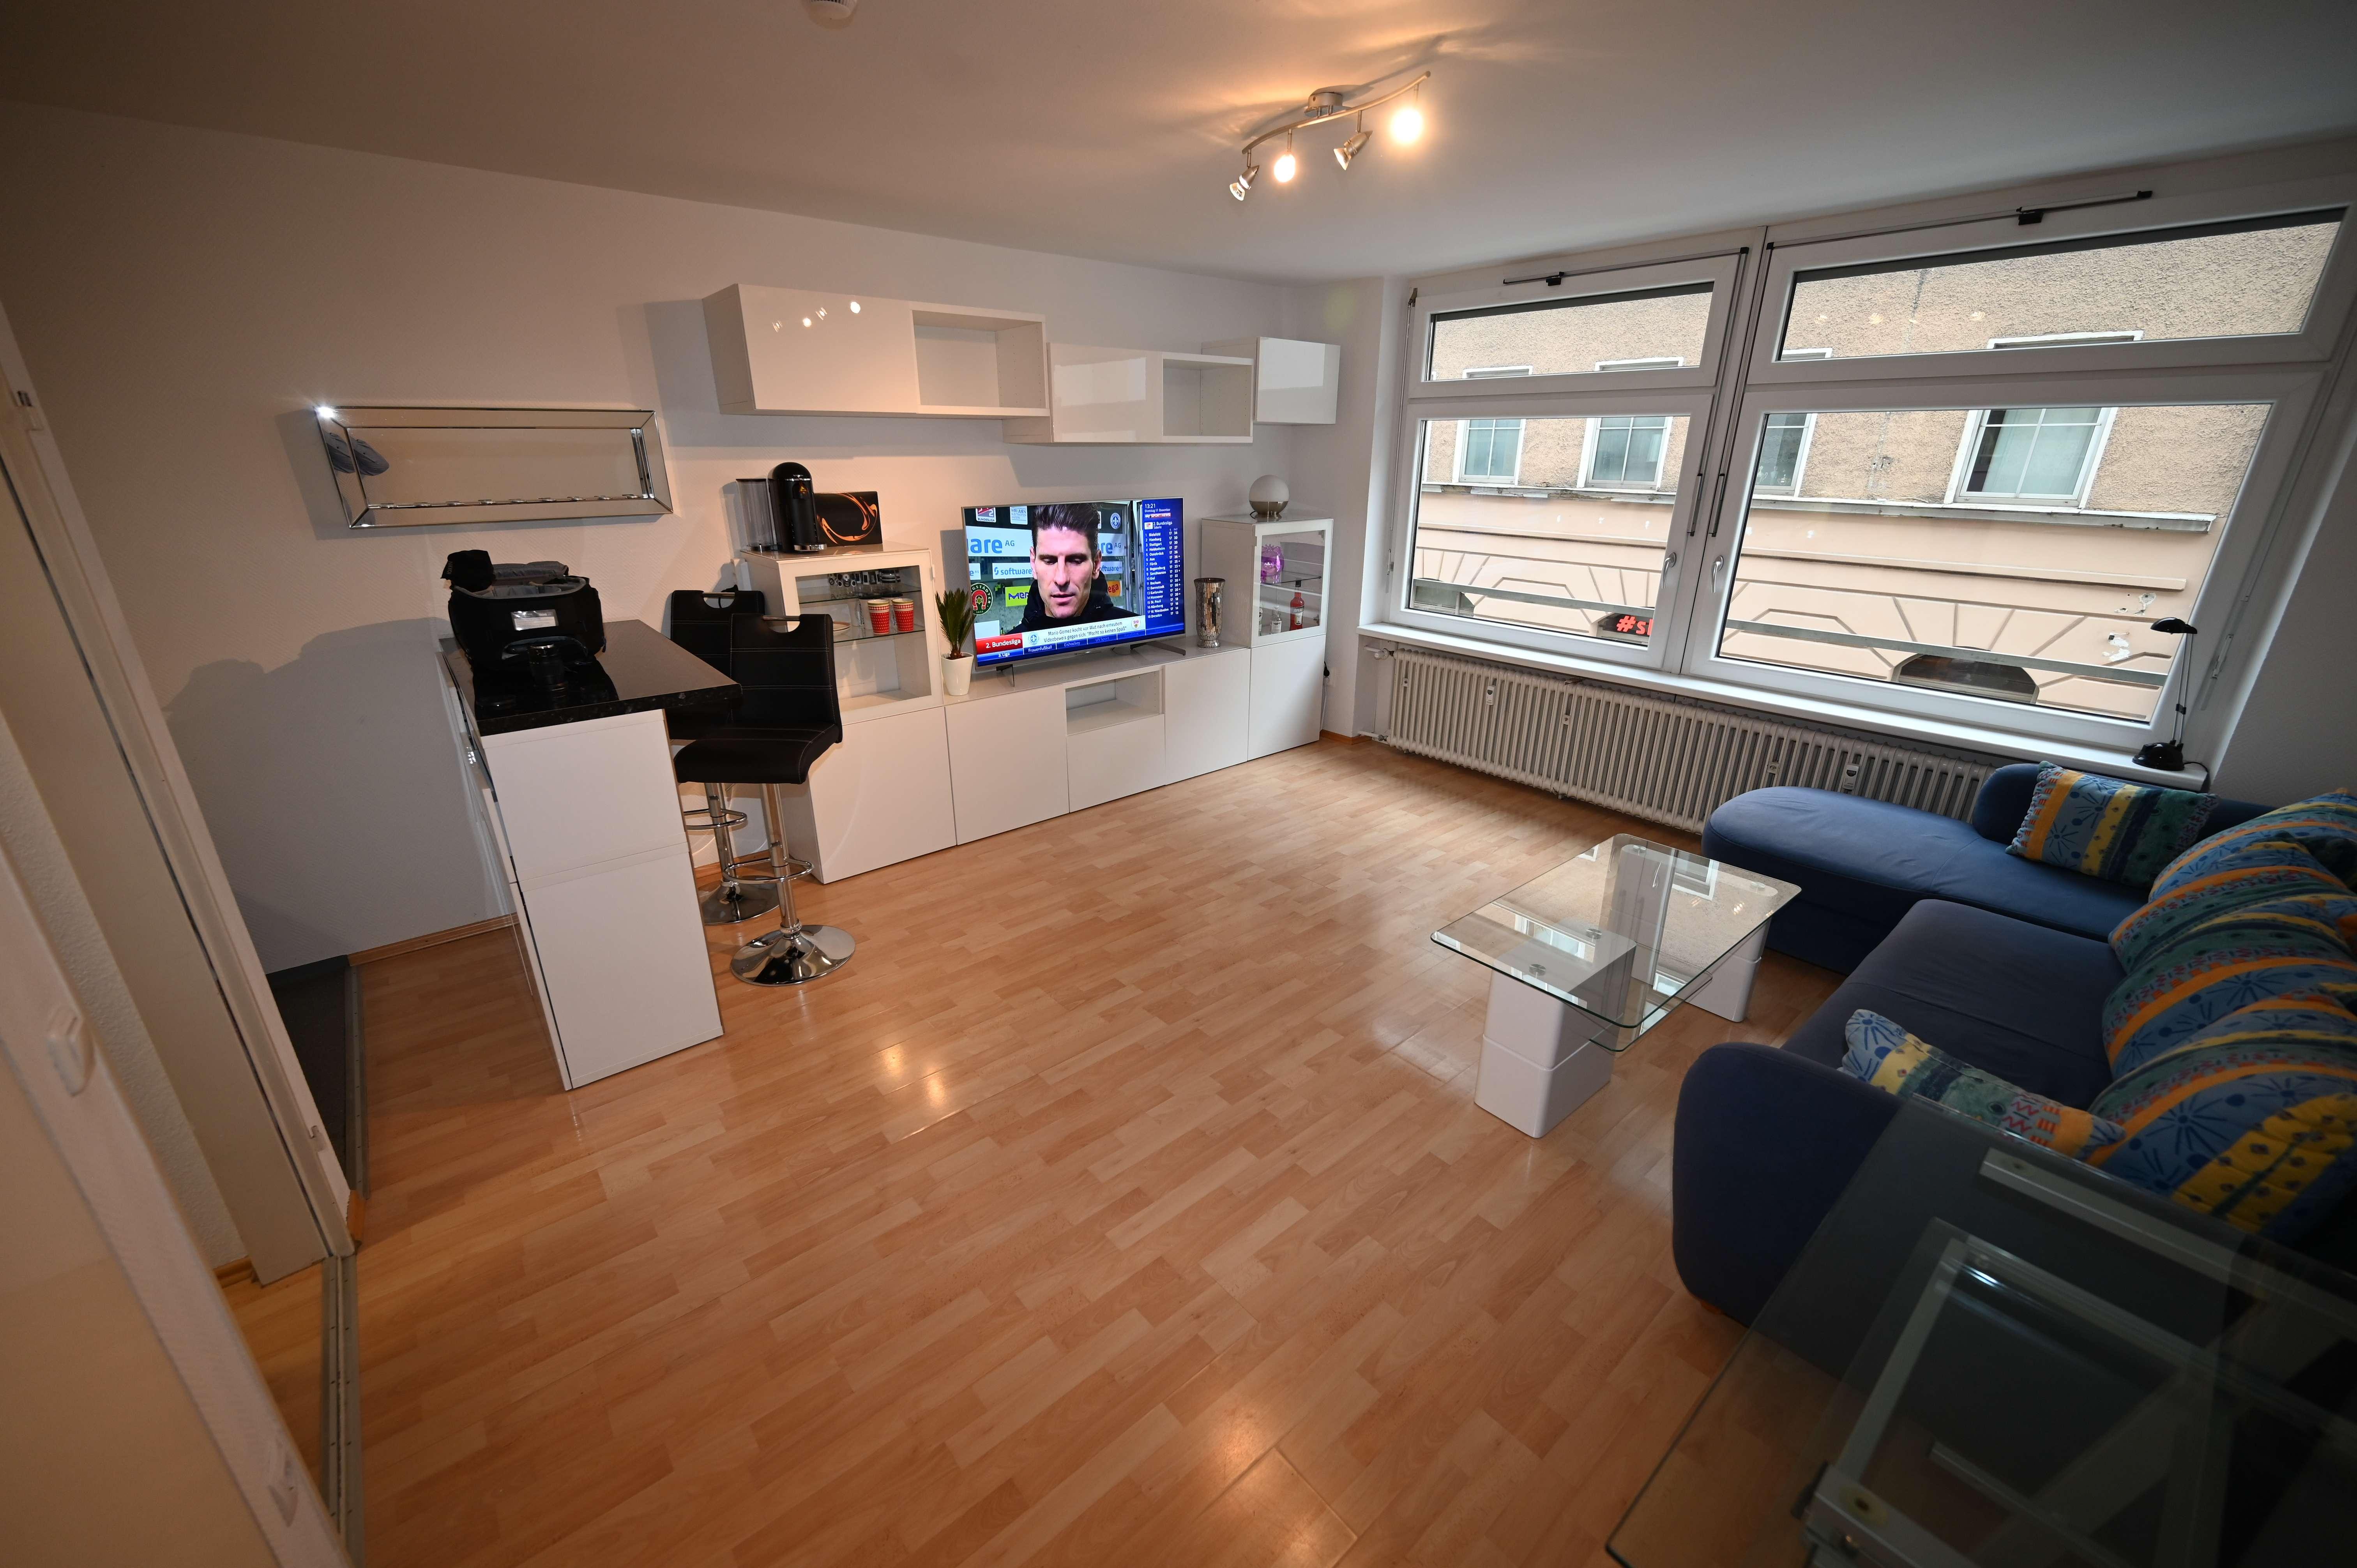 Möbliertes Luxus-Appartement in Altschwabing in Schwabing (München)